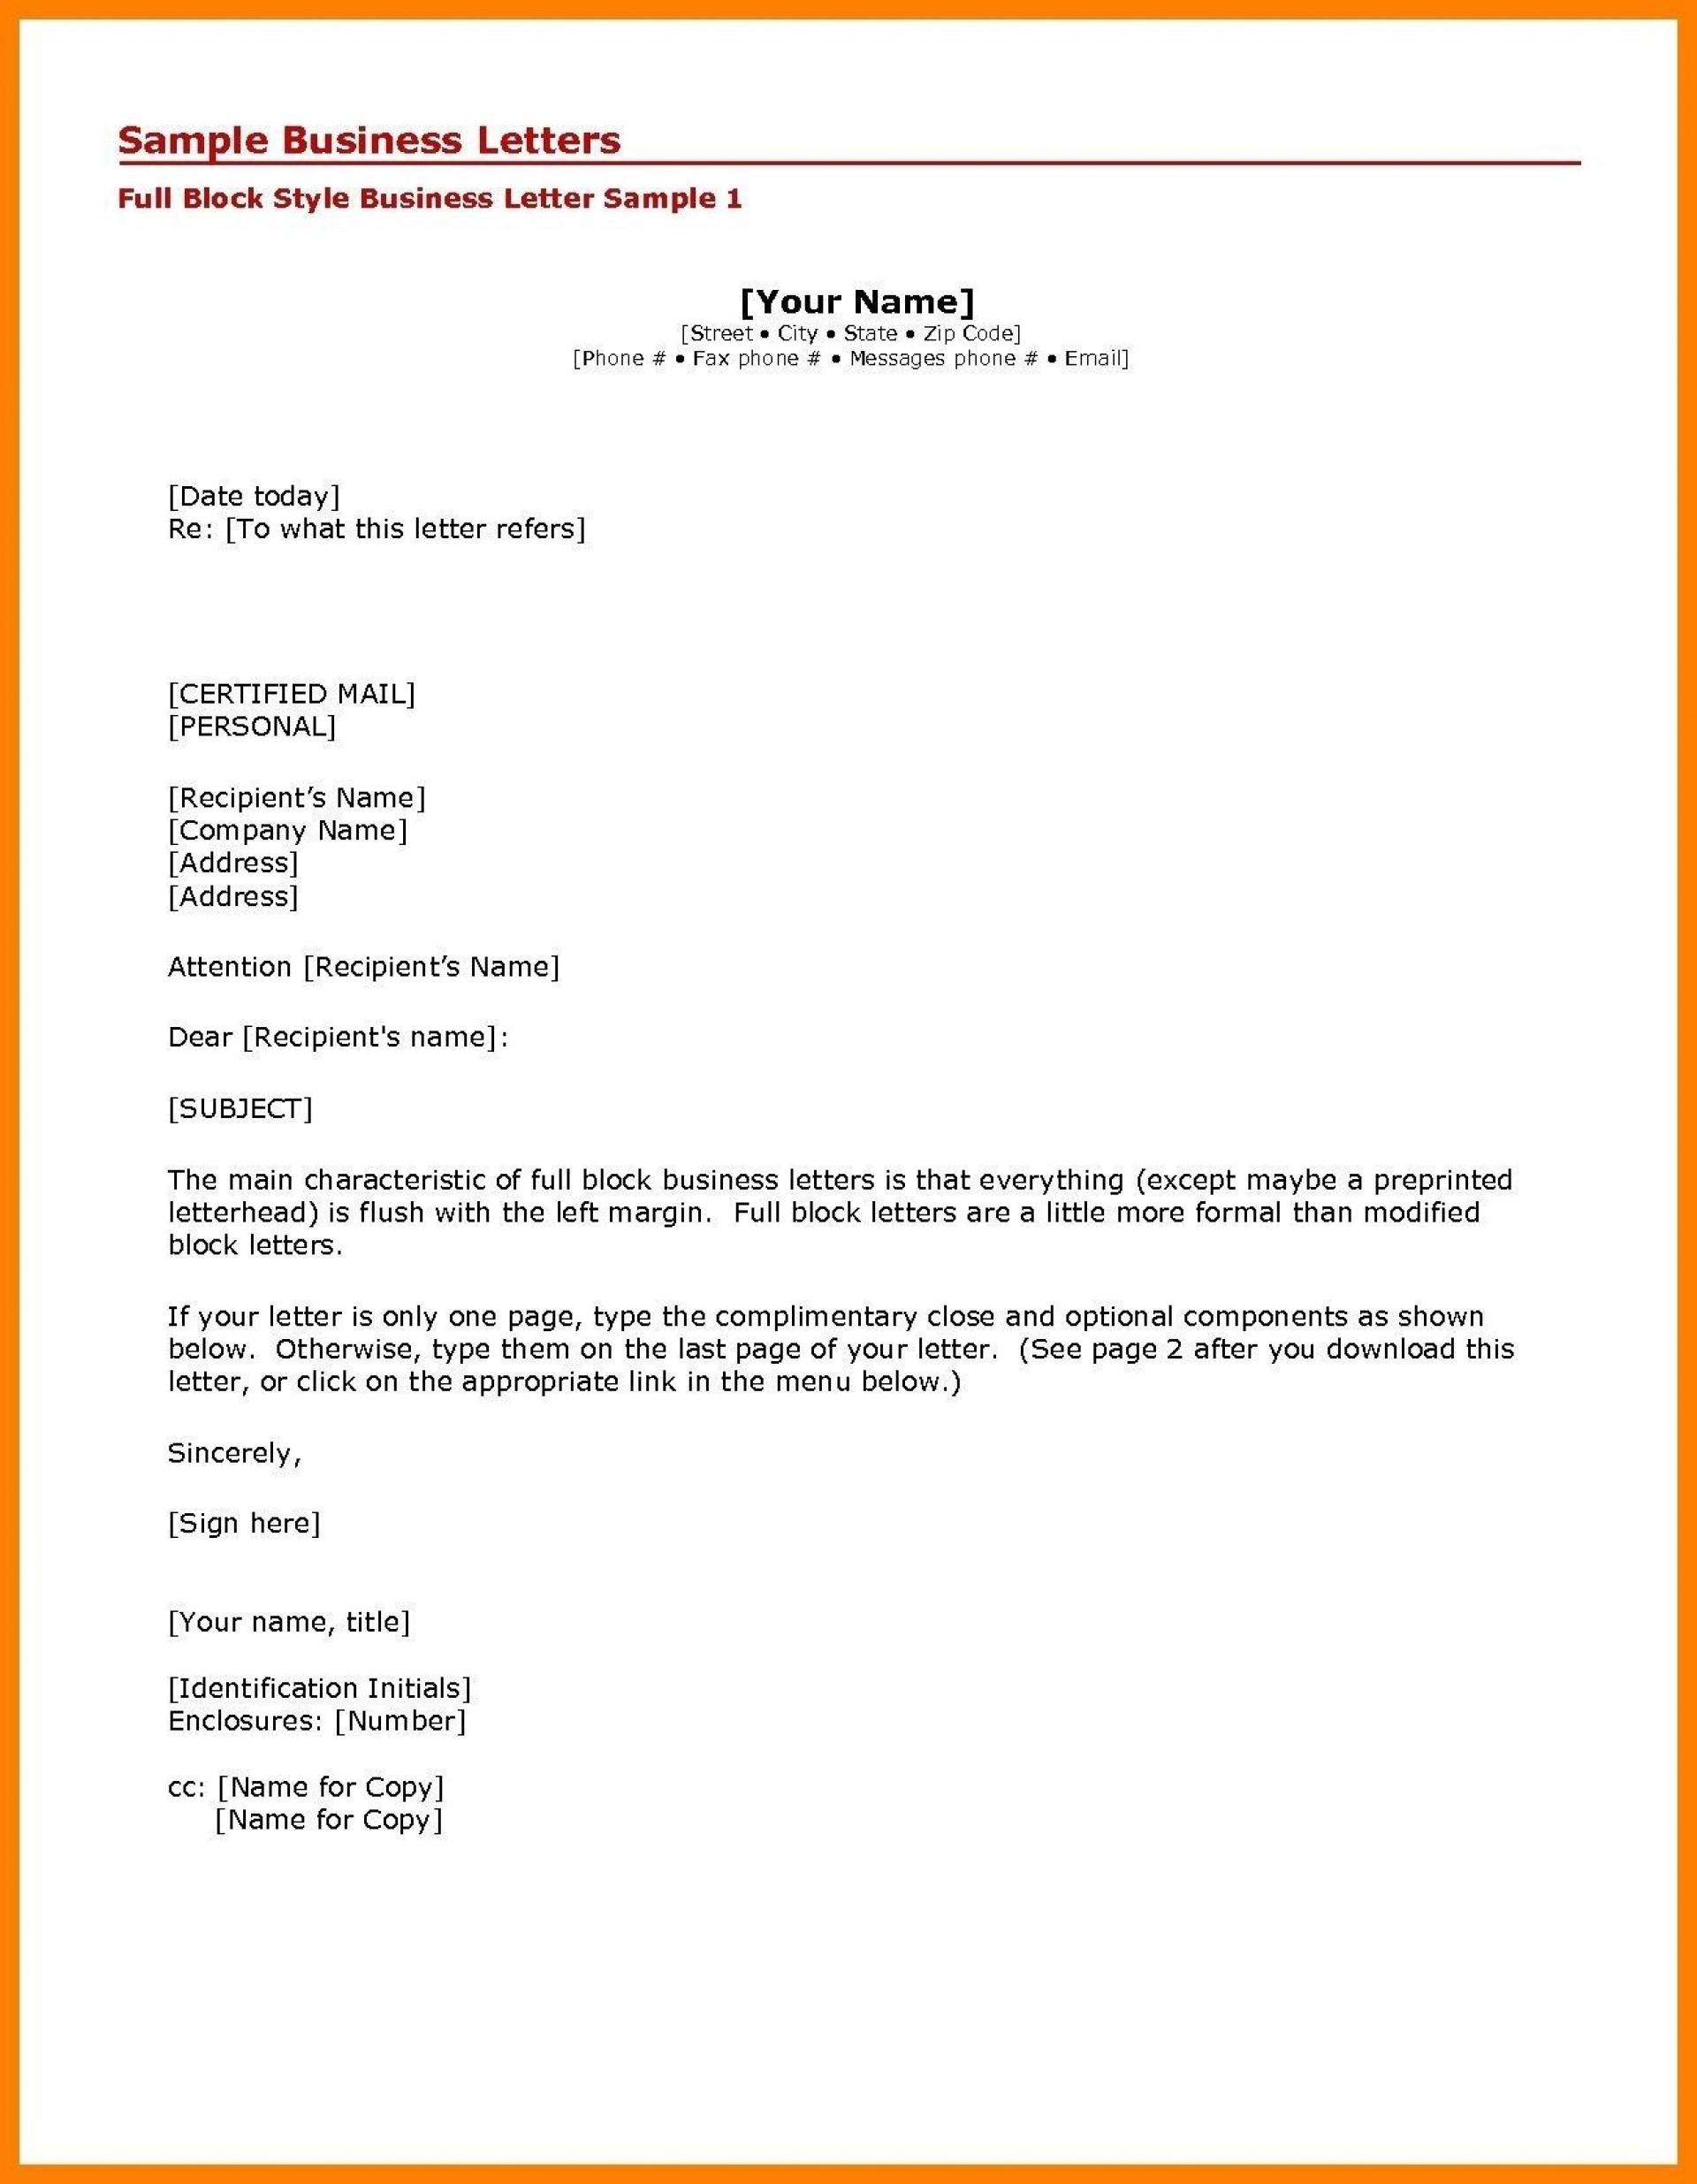 005 Simple Formal Busines Letter Template High Definition  Pdf Australia Format1920